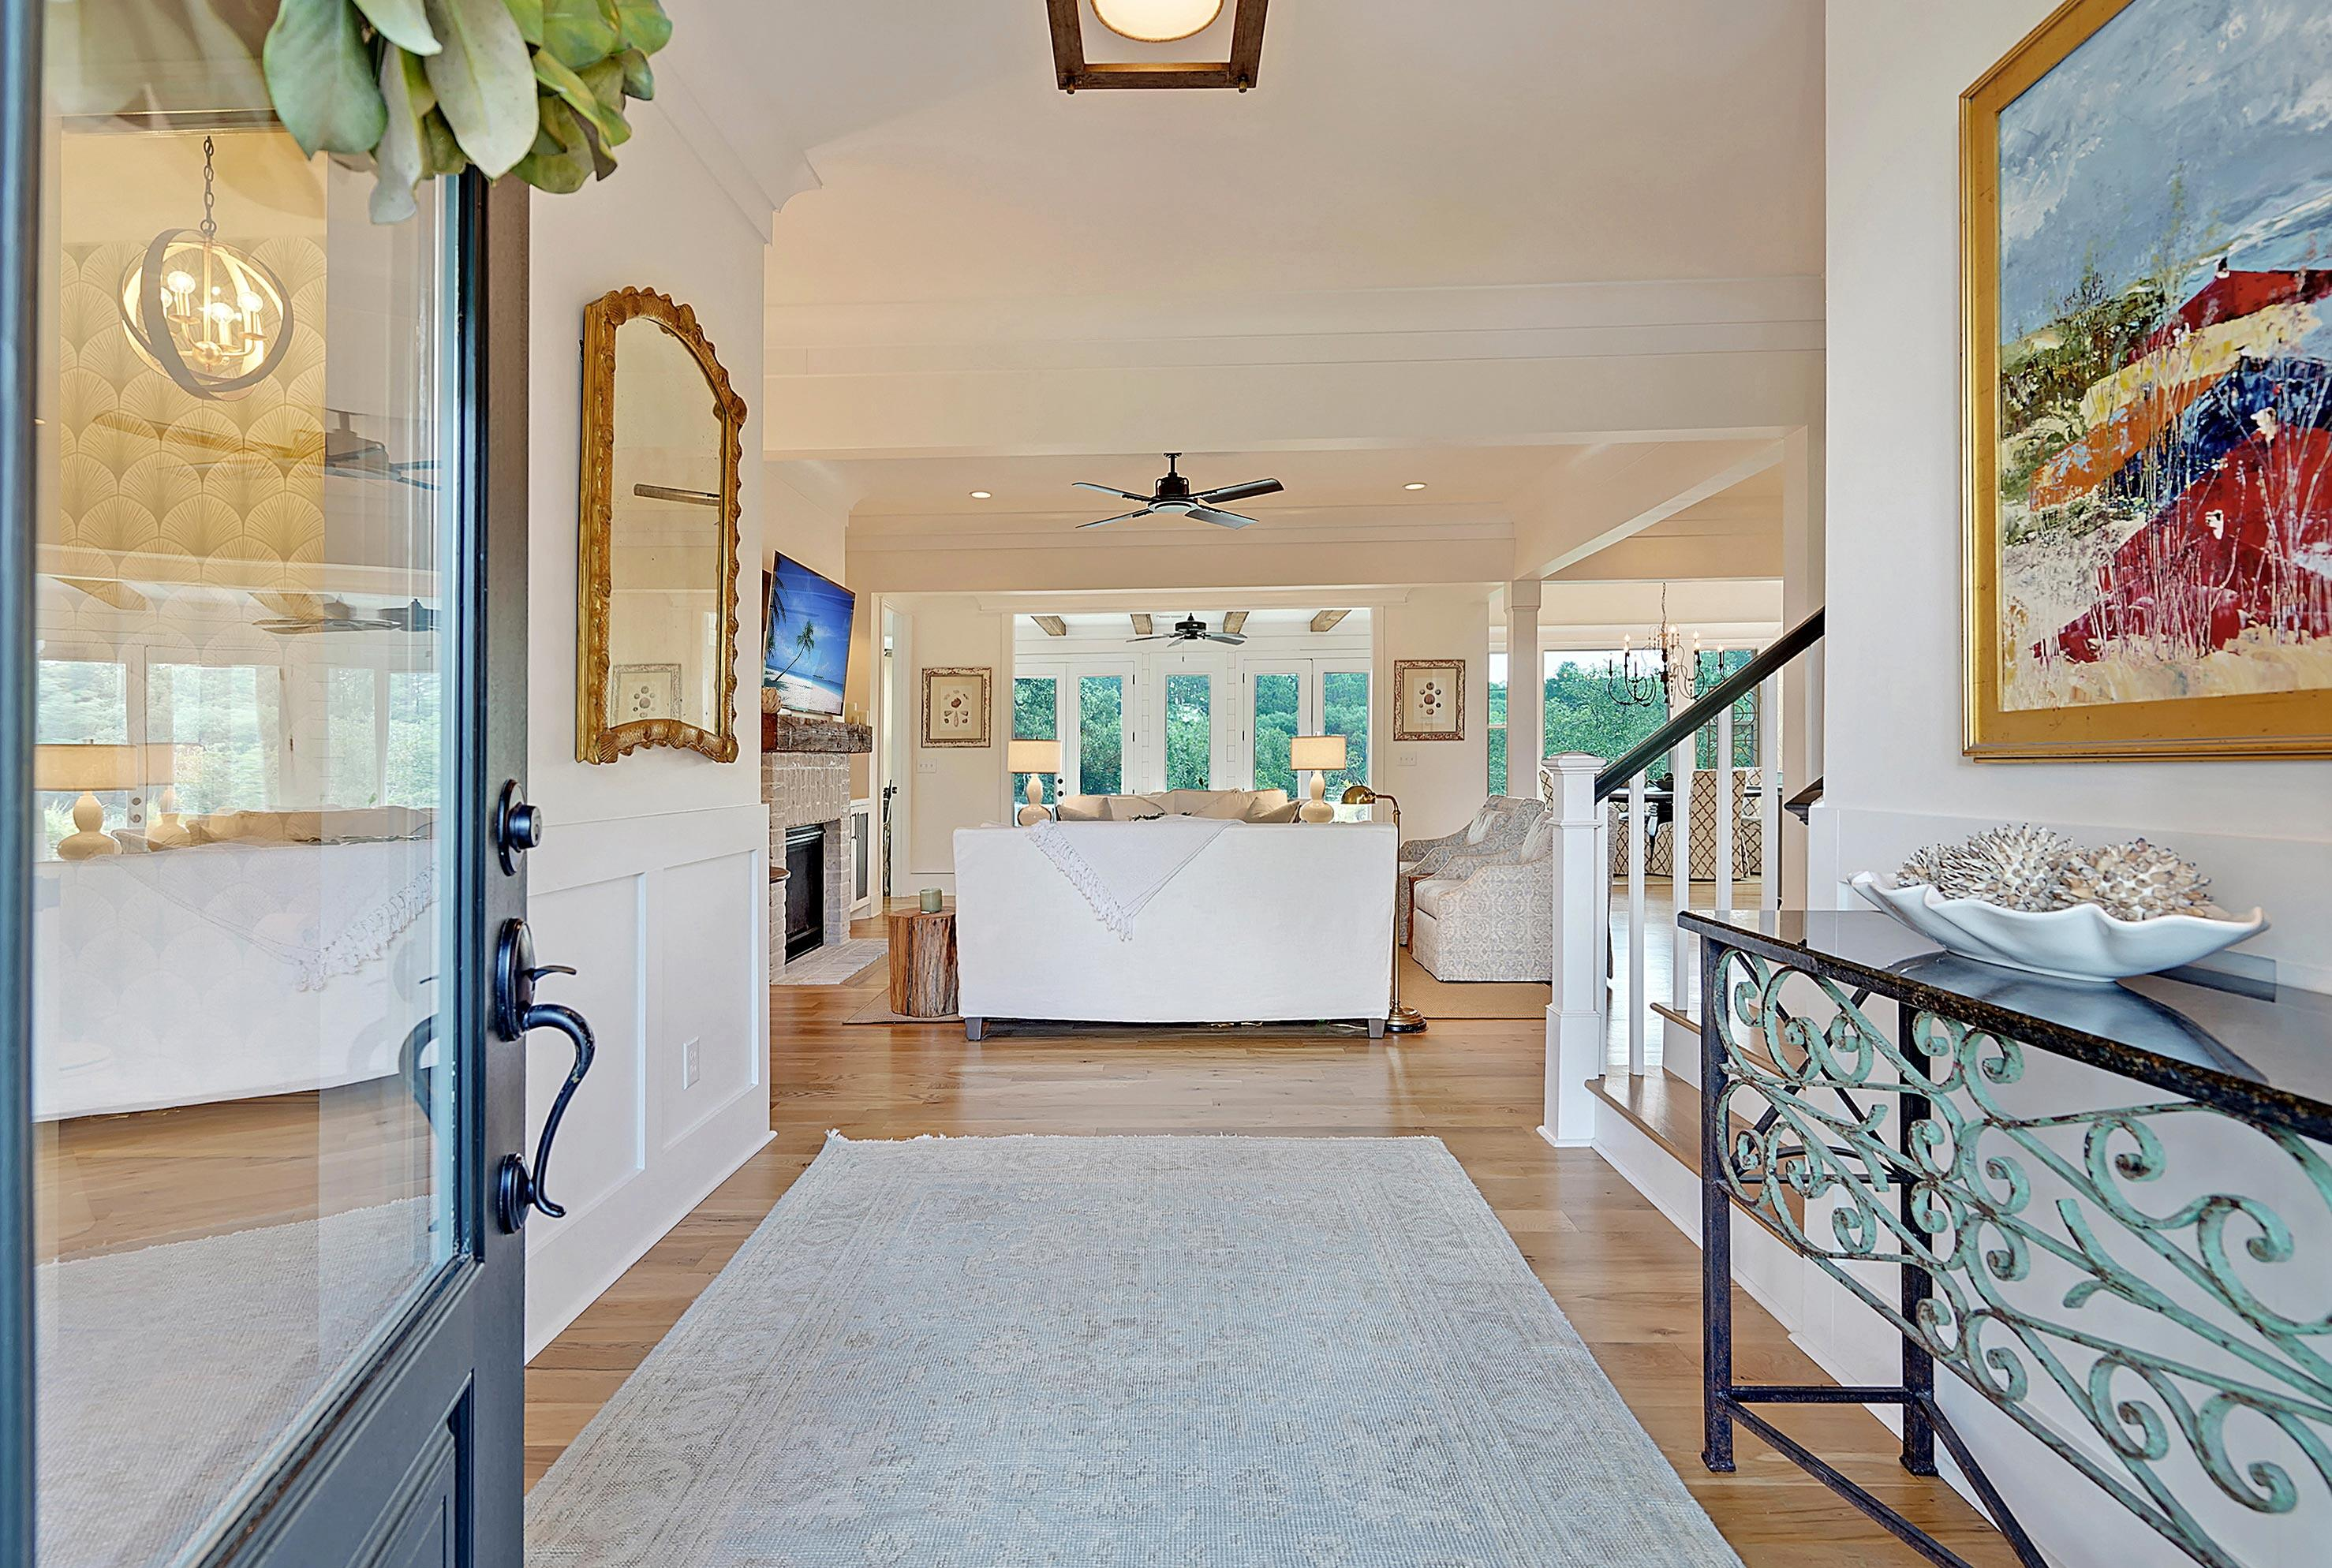 Grassy Creek Homes For Sale - 294 River Oak, Mount Pleasant, SC - 53